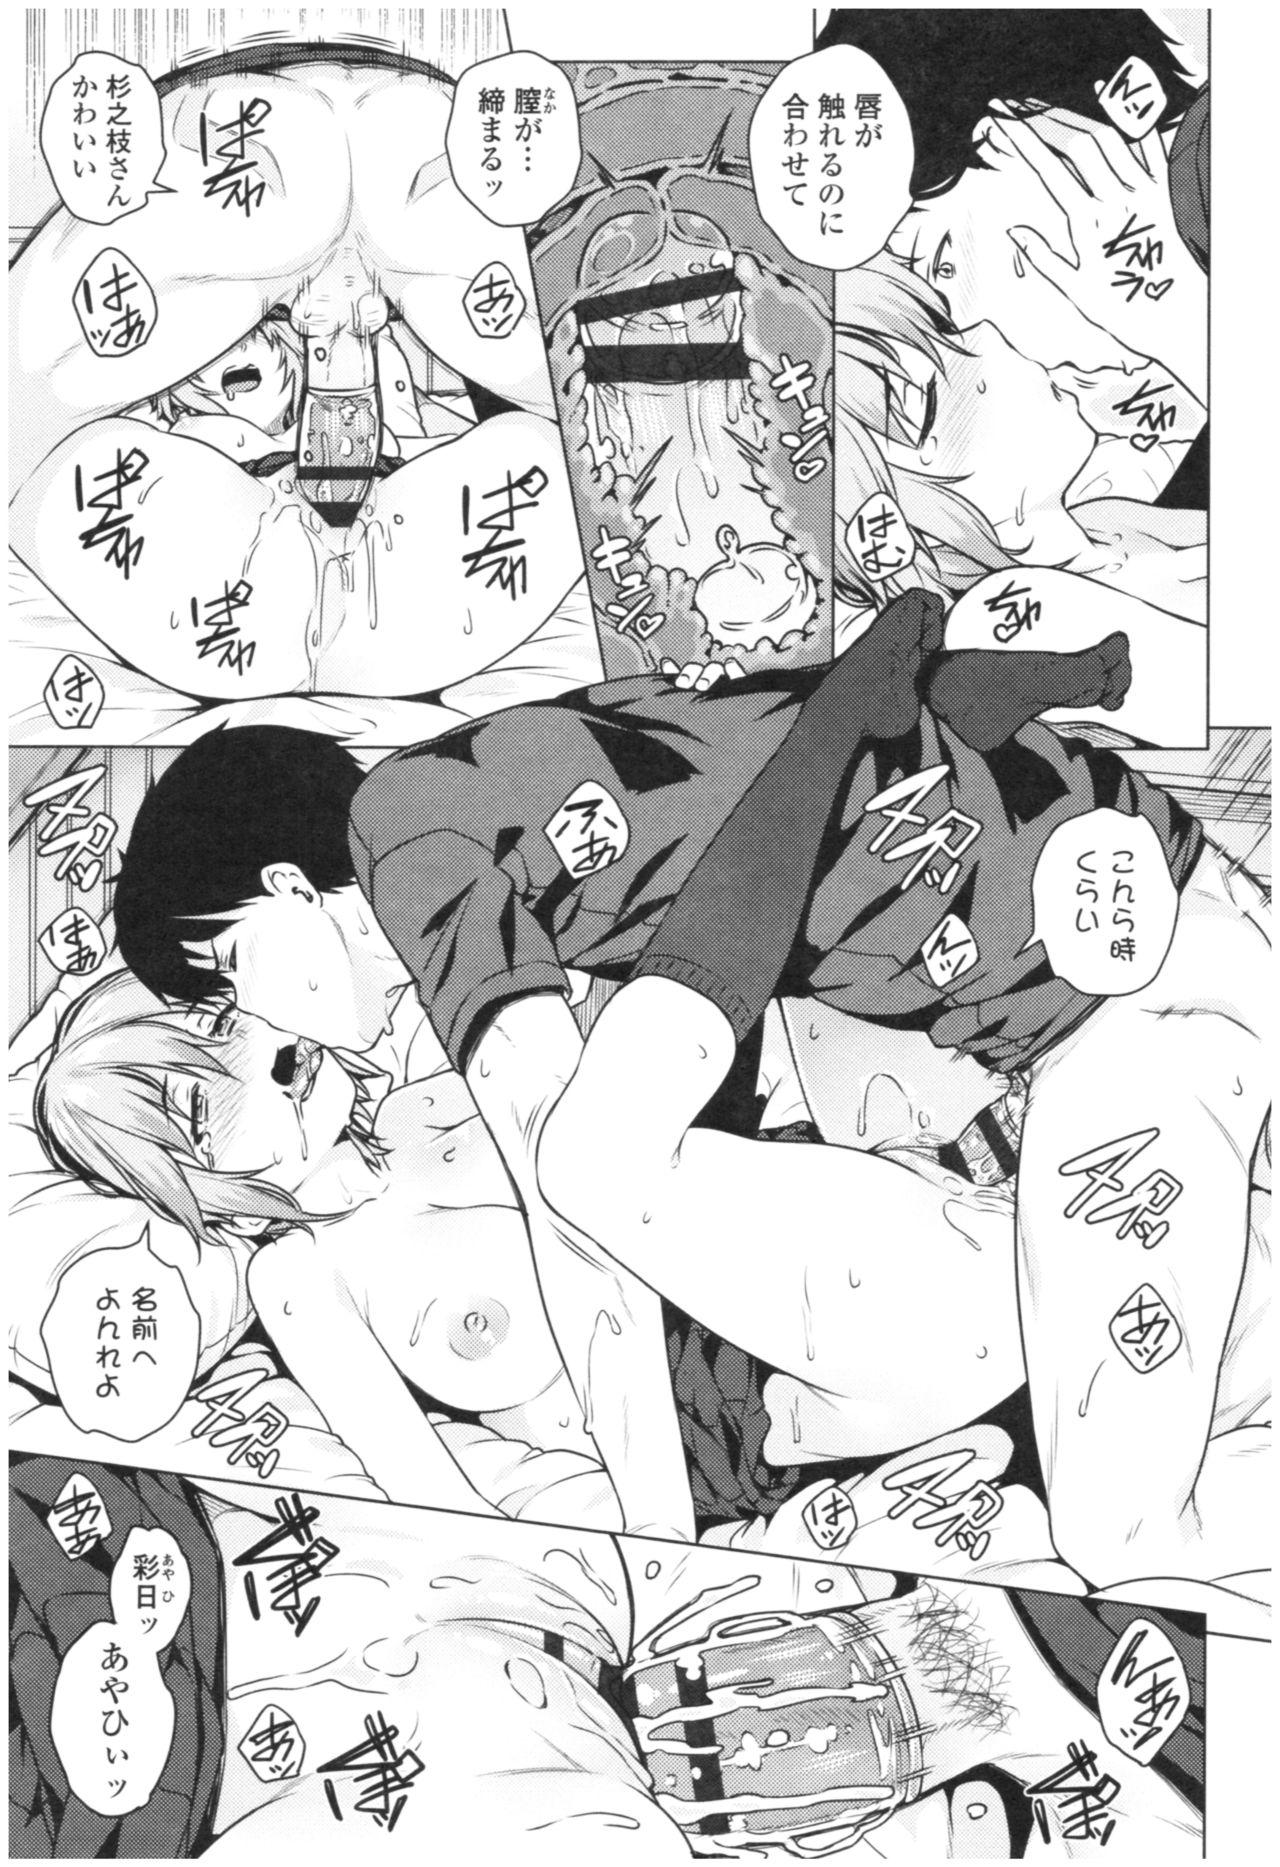 Bitch Kanojo no Hatsukoi Jouji - Her Lewd First Love and SEX 42